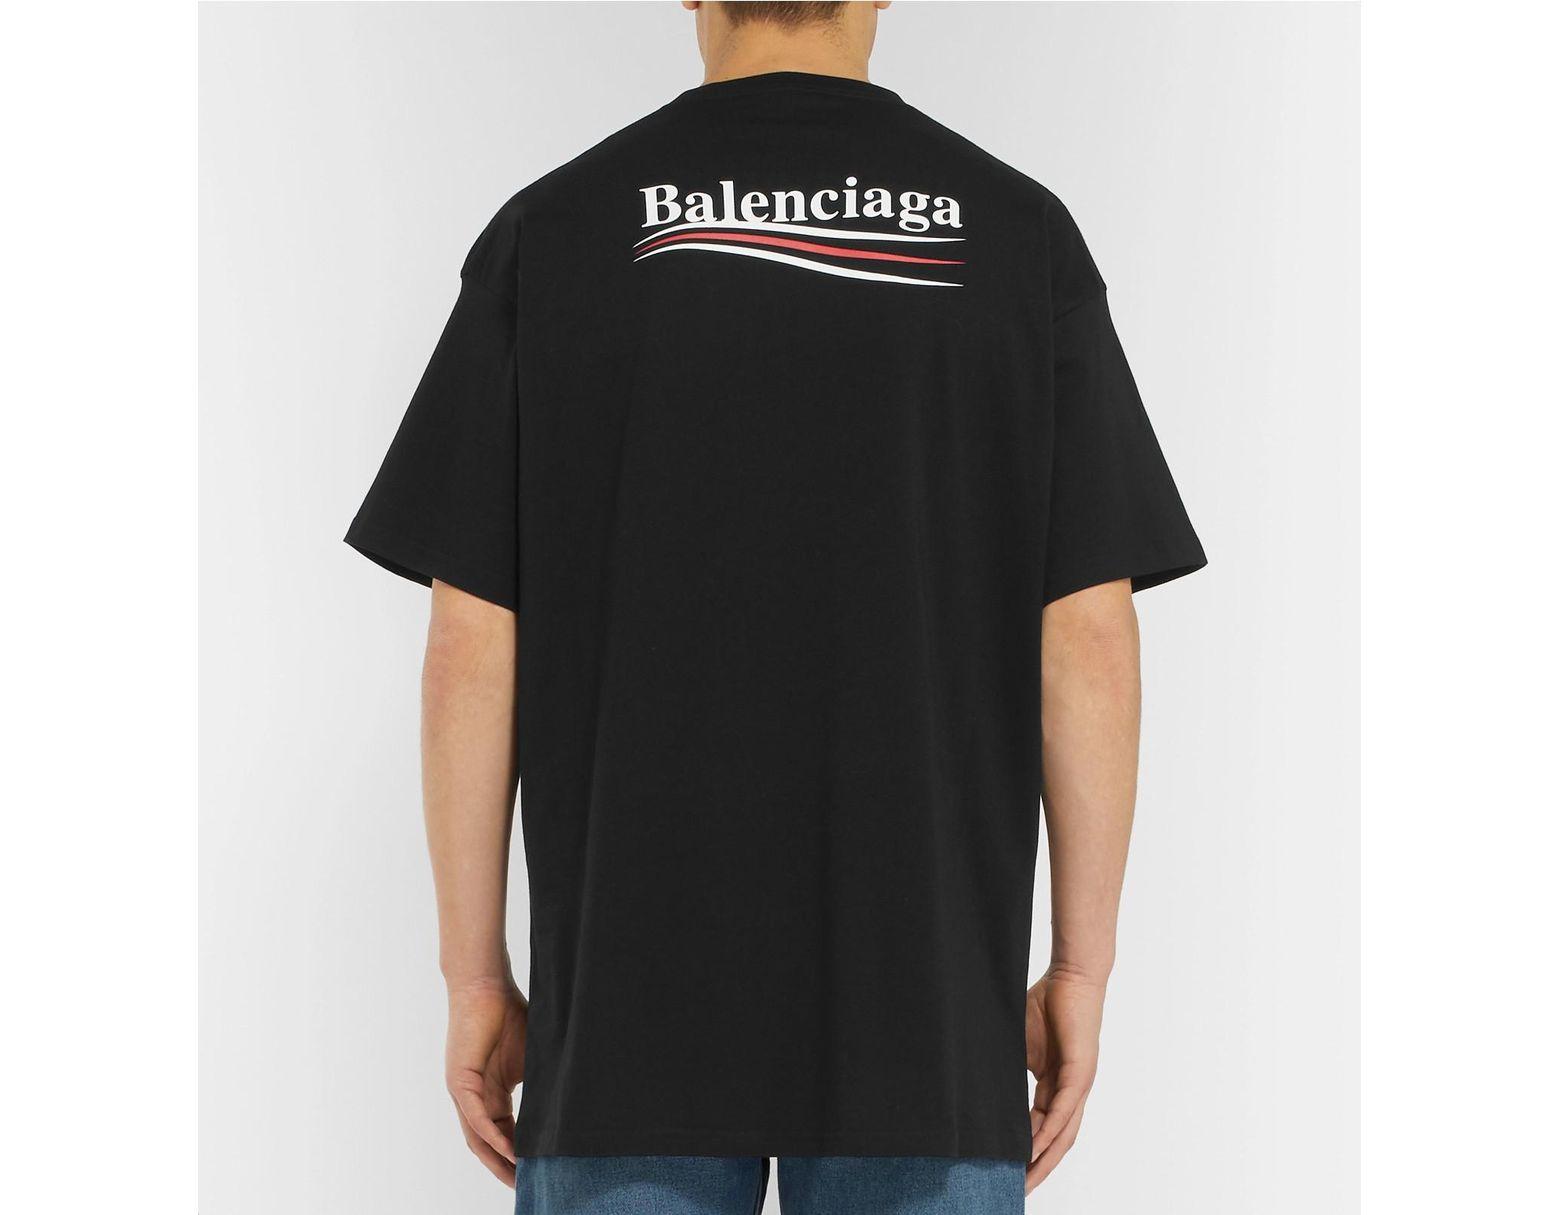 f2770857b752 Balenciaga Oversized Logo-print Cotton-jersey T-shirt in Black for Men -  Save 32% - Lyst